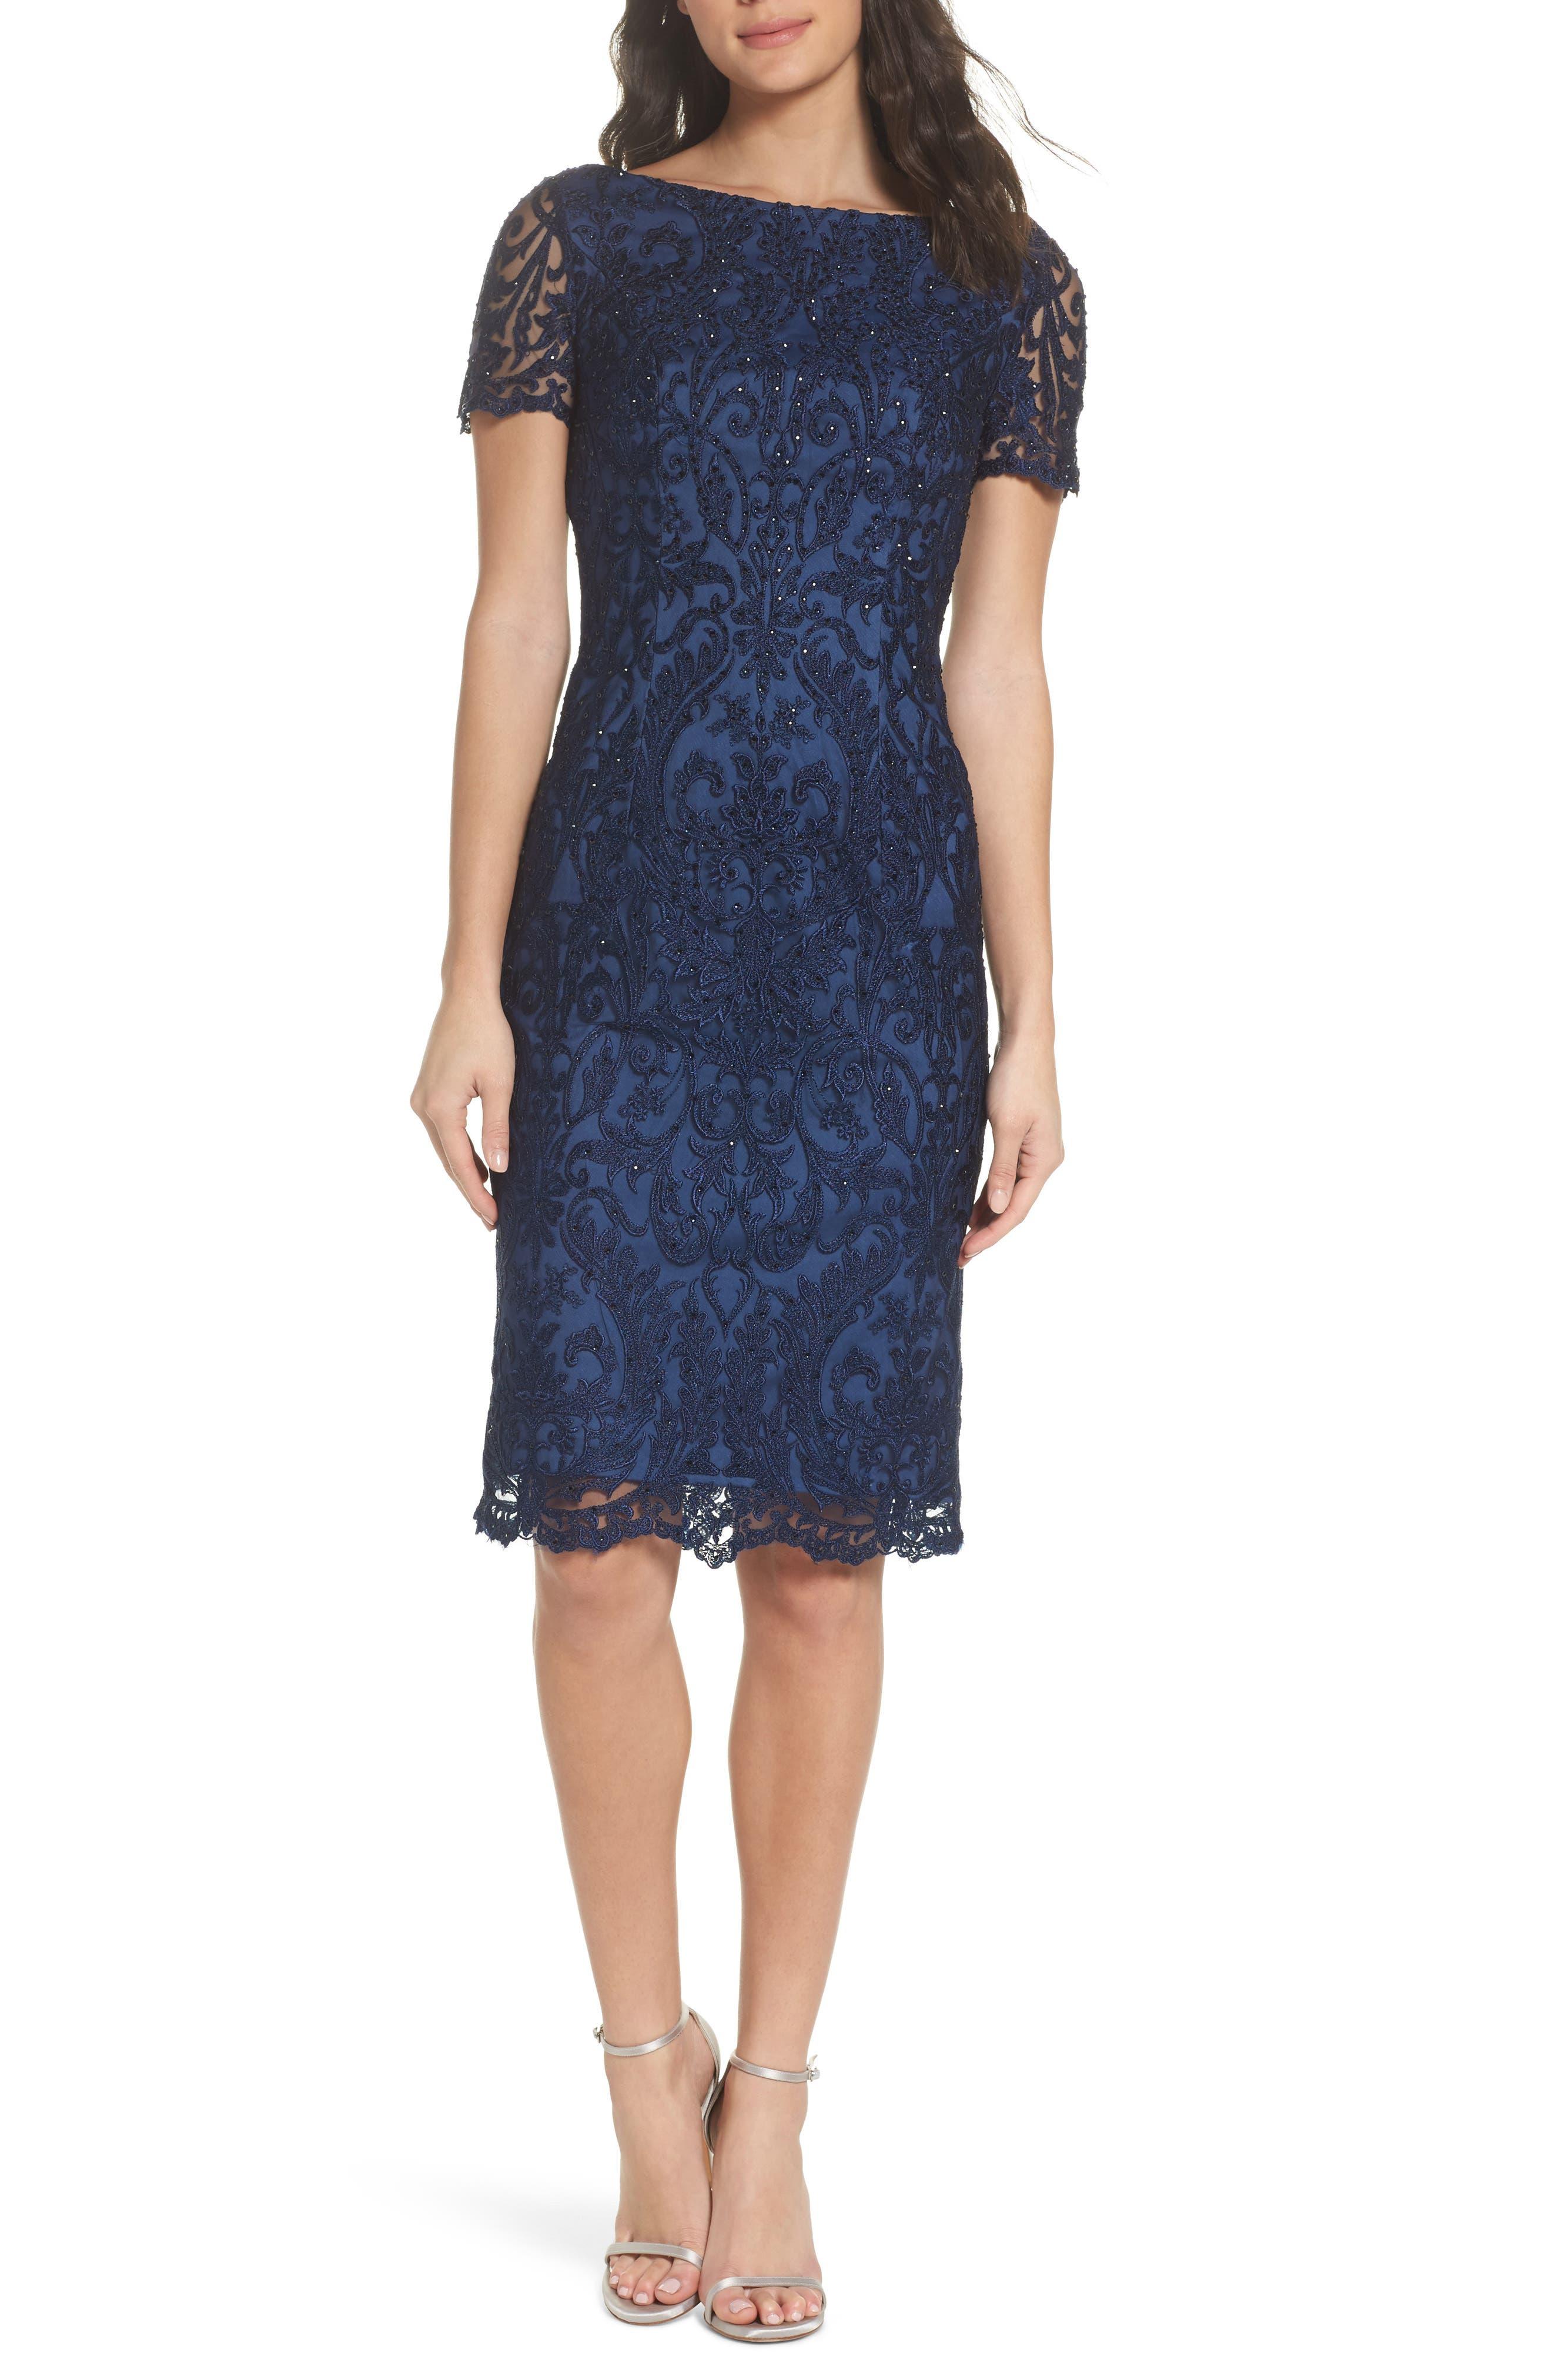 LA FEMME Beaded Lace Sheath Dress, Main, color, SLATE BLUE